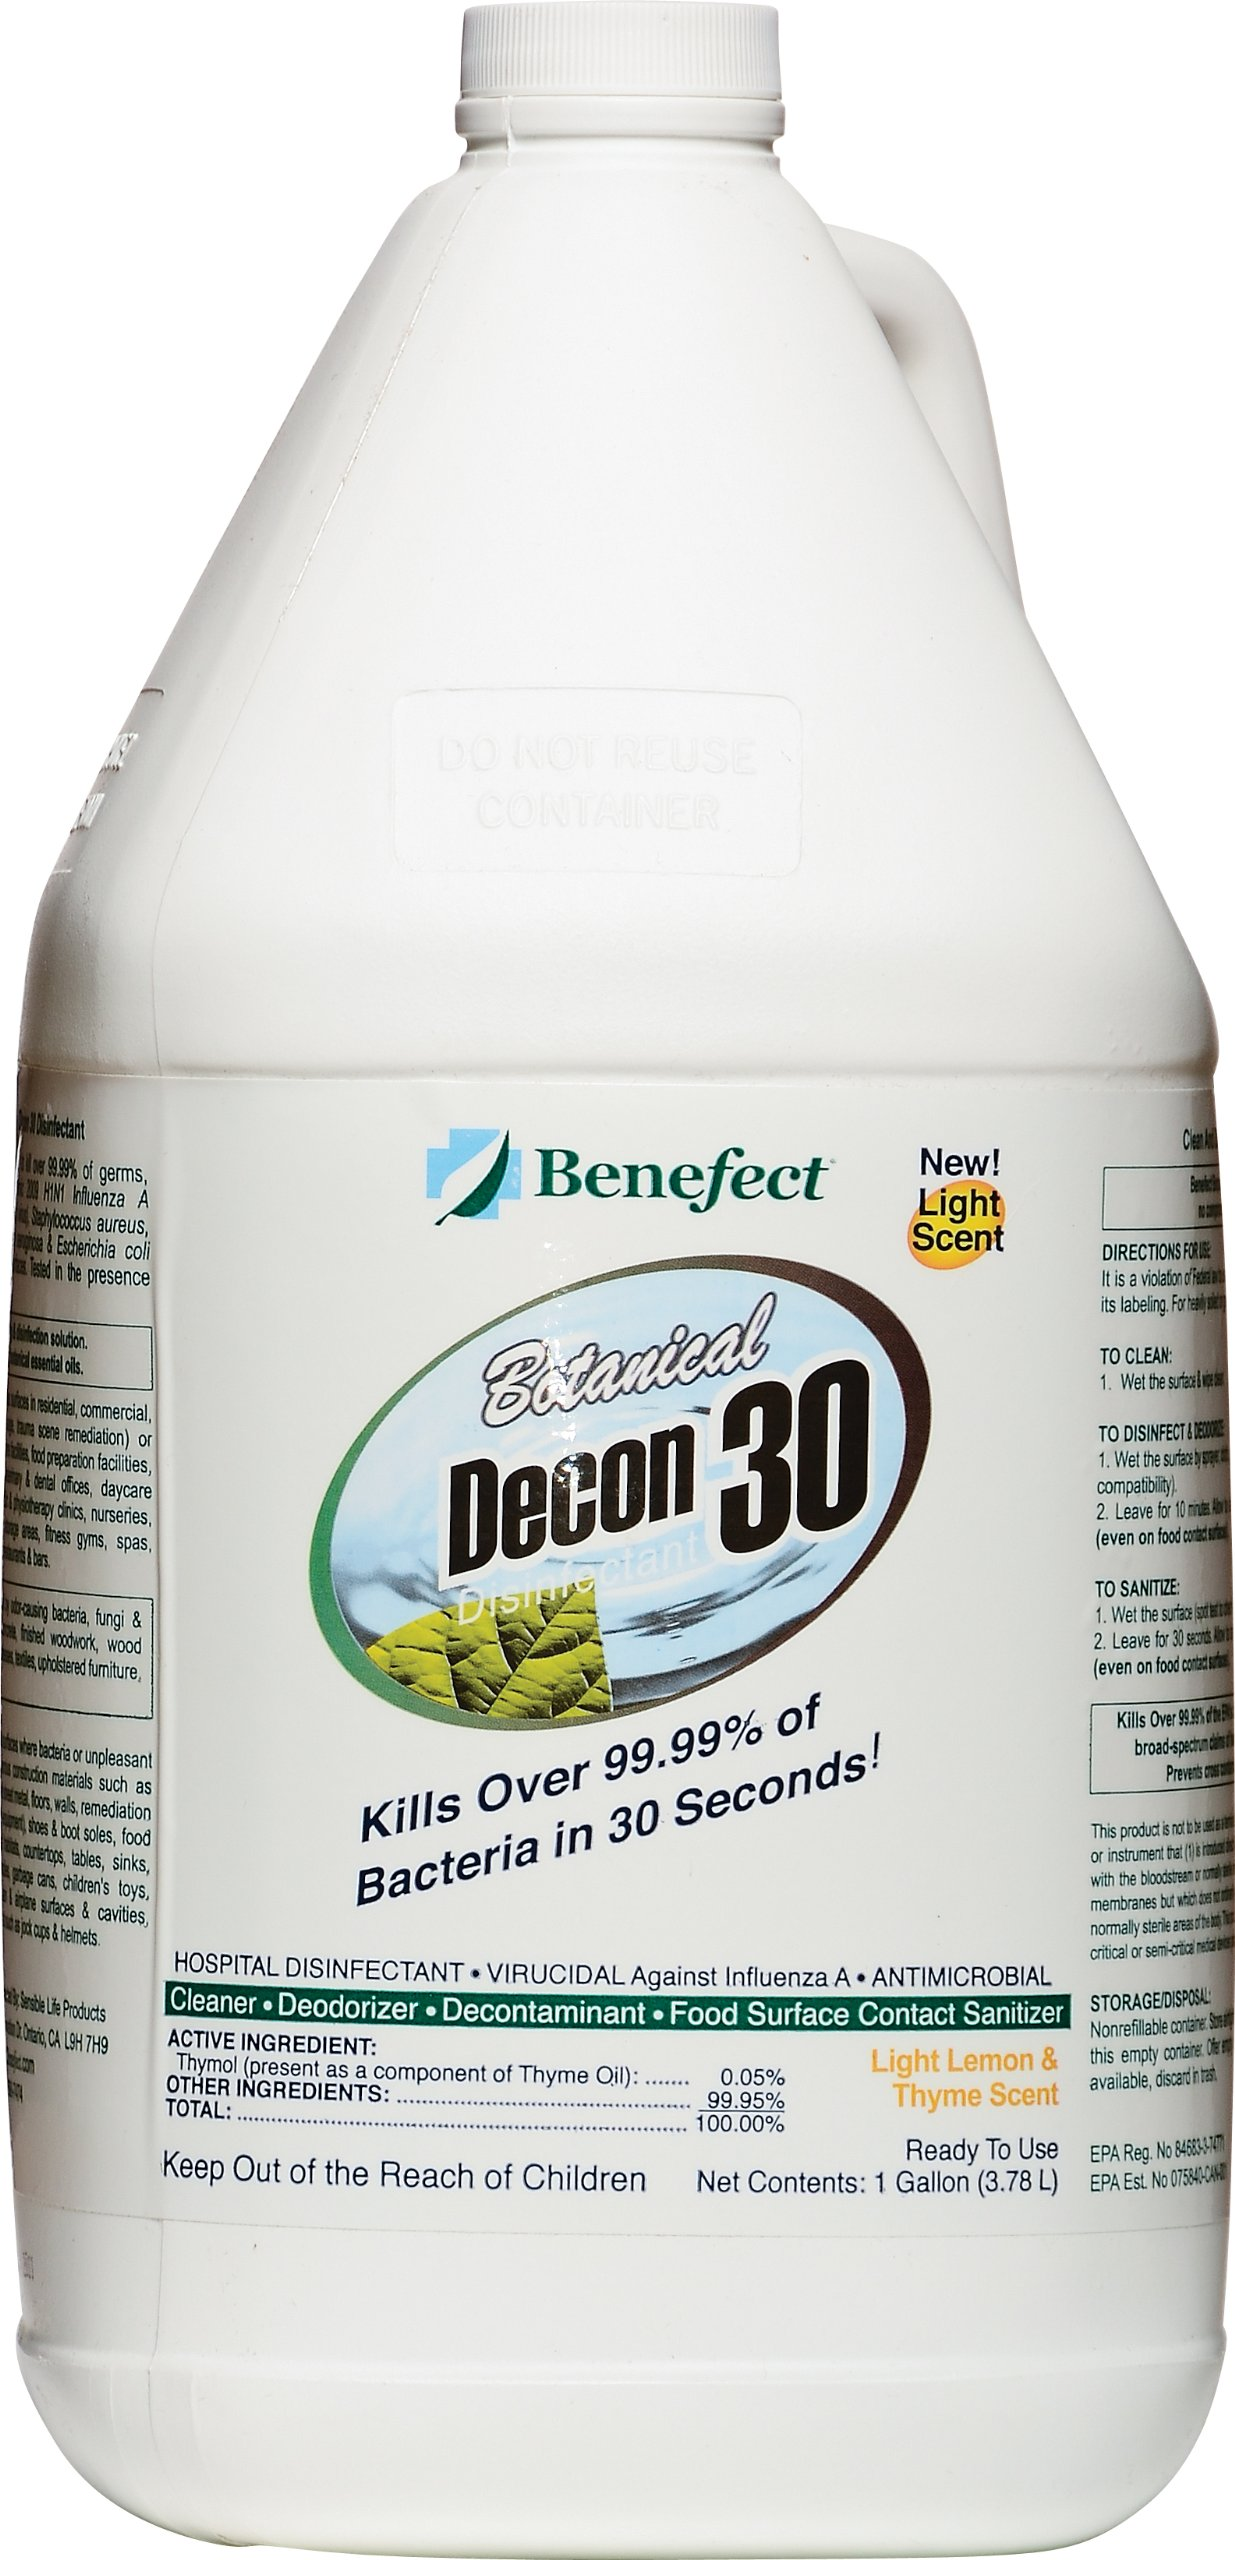 Benefect CD33GL Botanical Decon 30